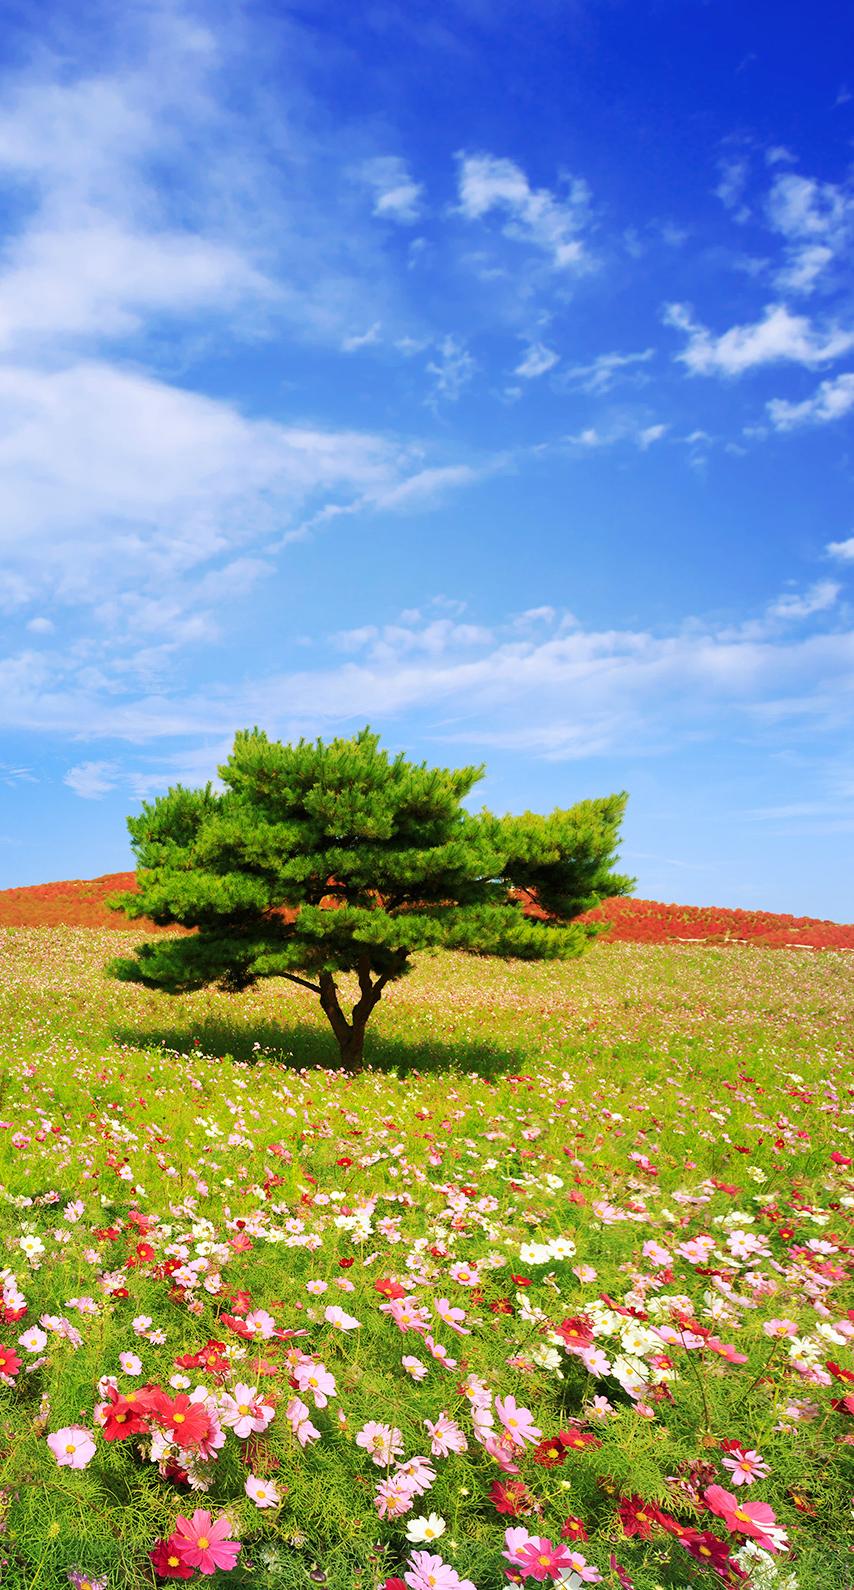 grass, tree